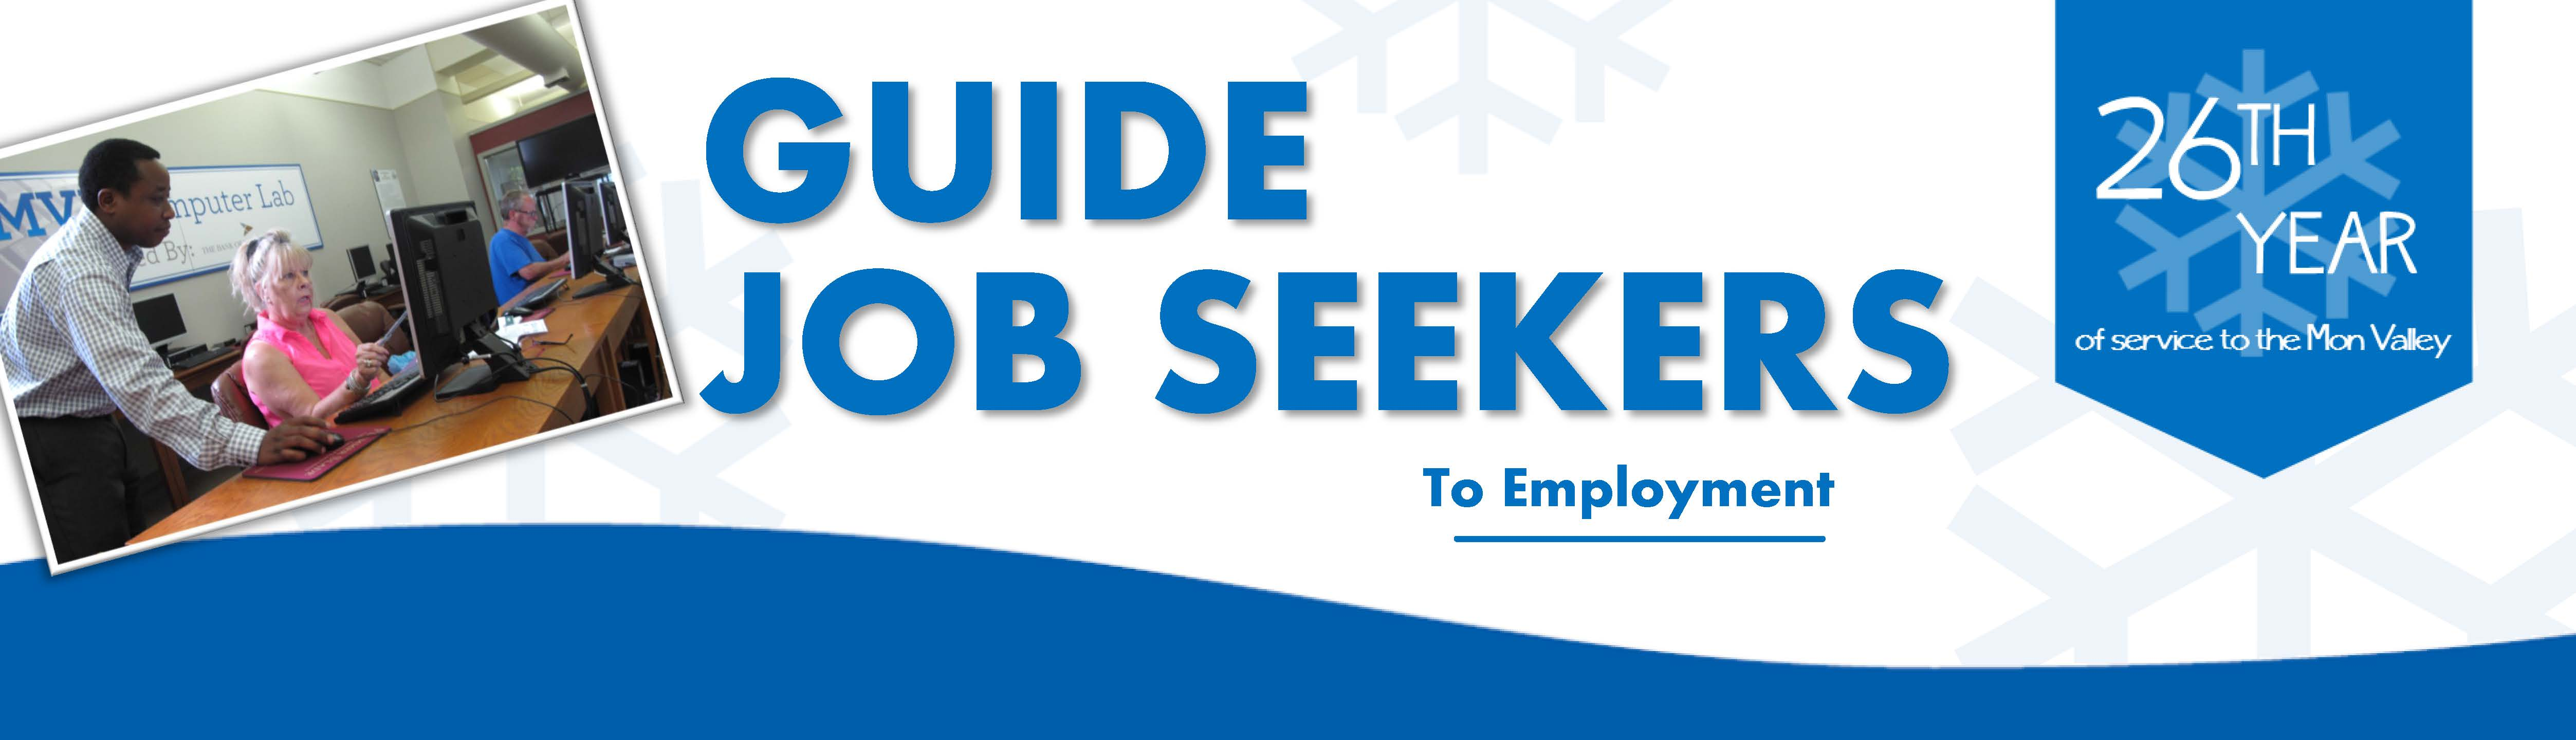 Preparing Job Seekers for Employment 2014